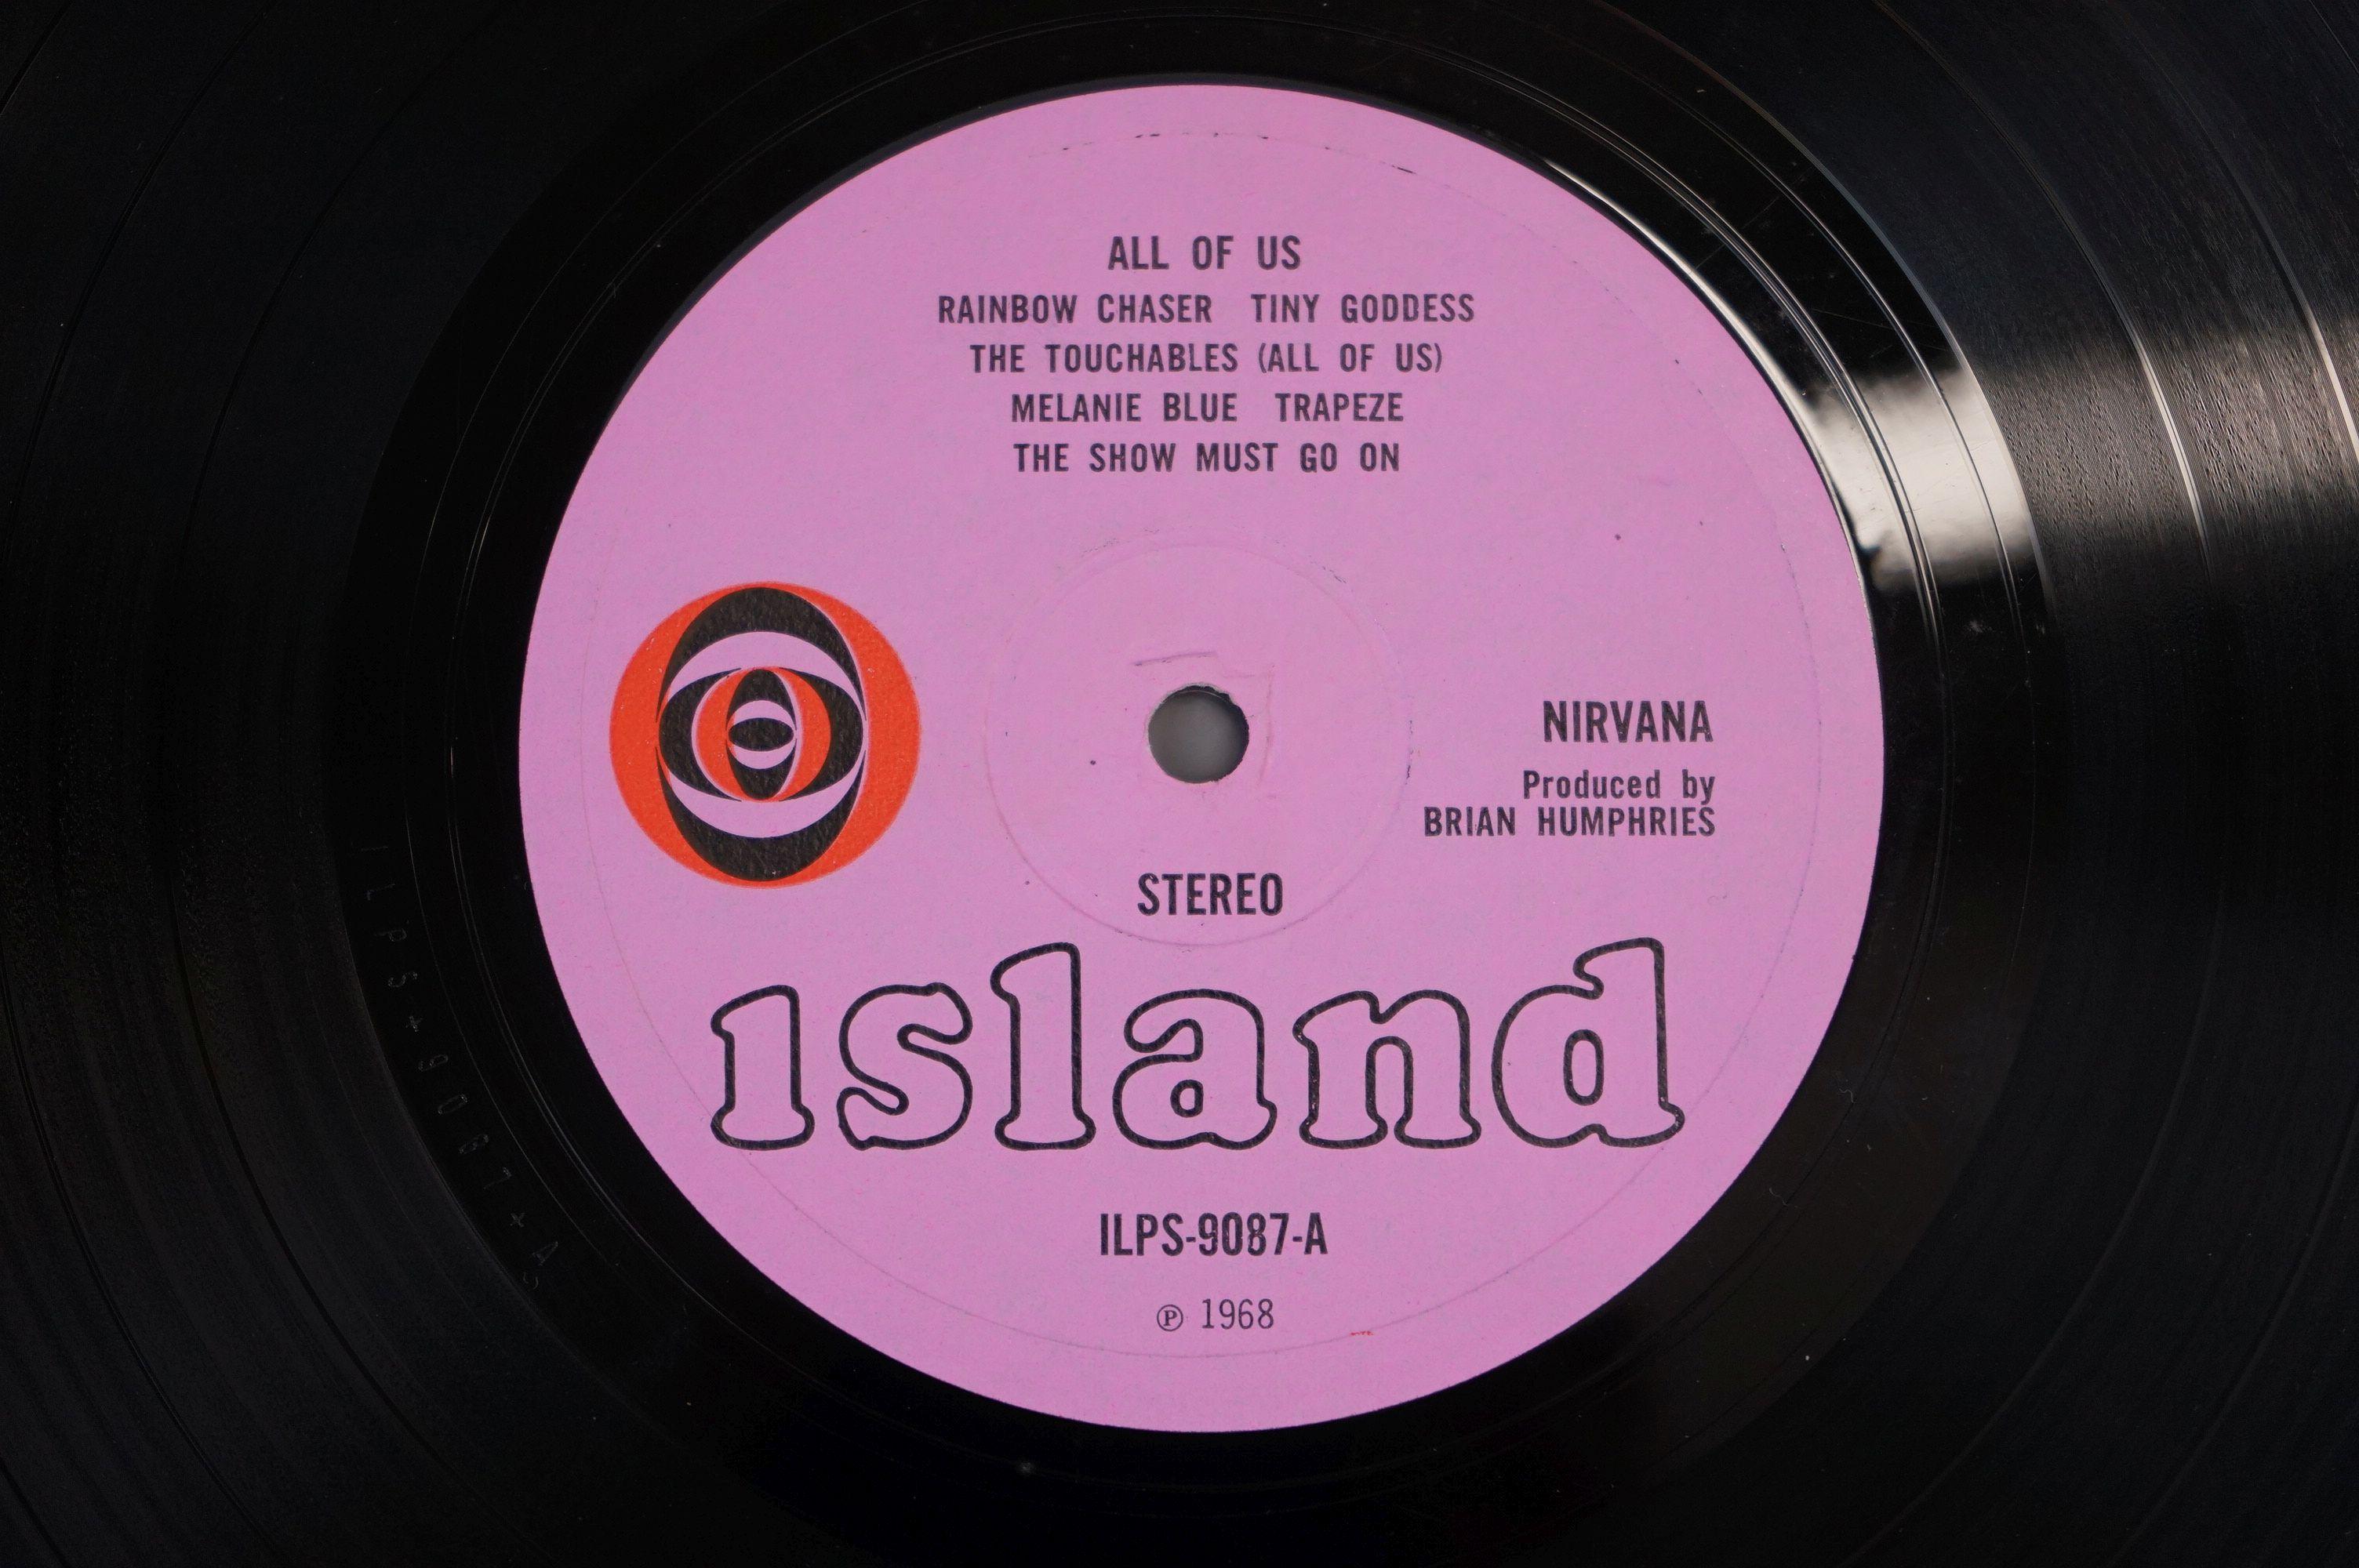 Vinyl - Nirvana All Of Us LP on Island ILPS 9087 with pink label, orange/black circle logo, - Image 4 of 6